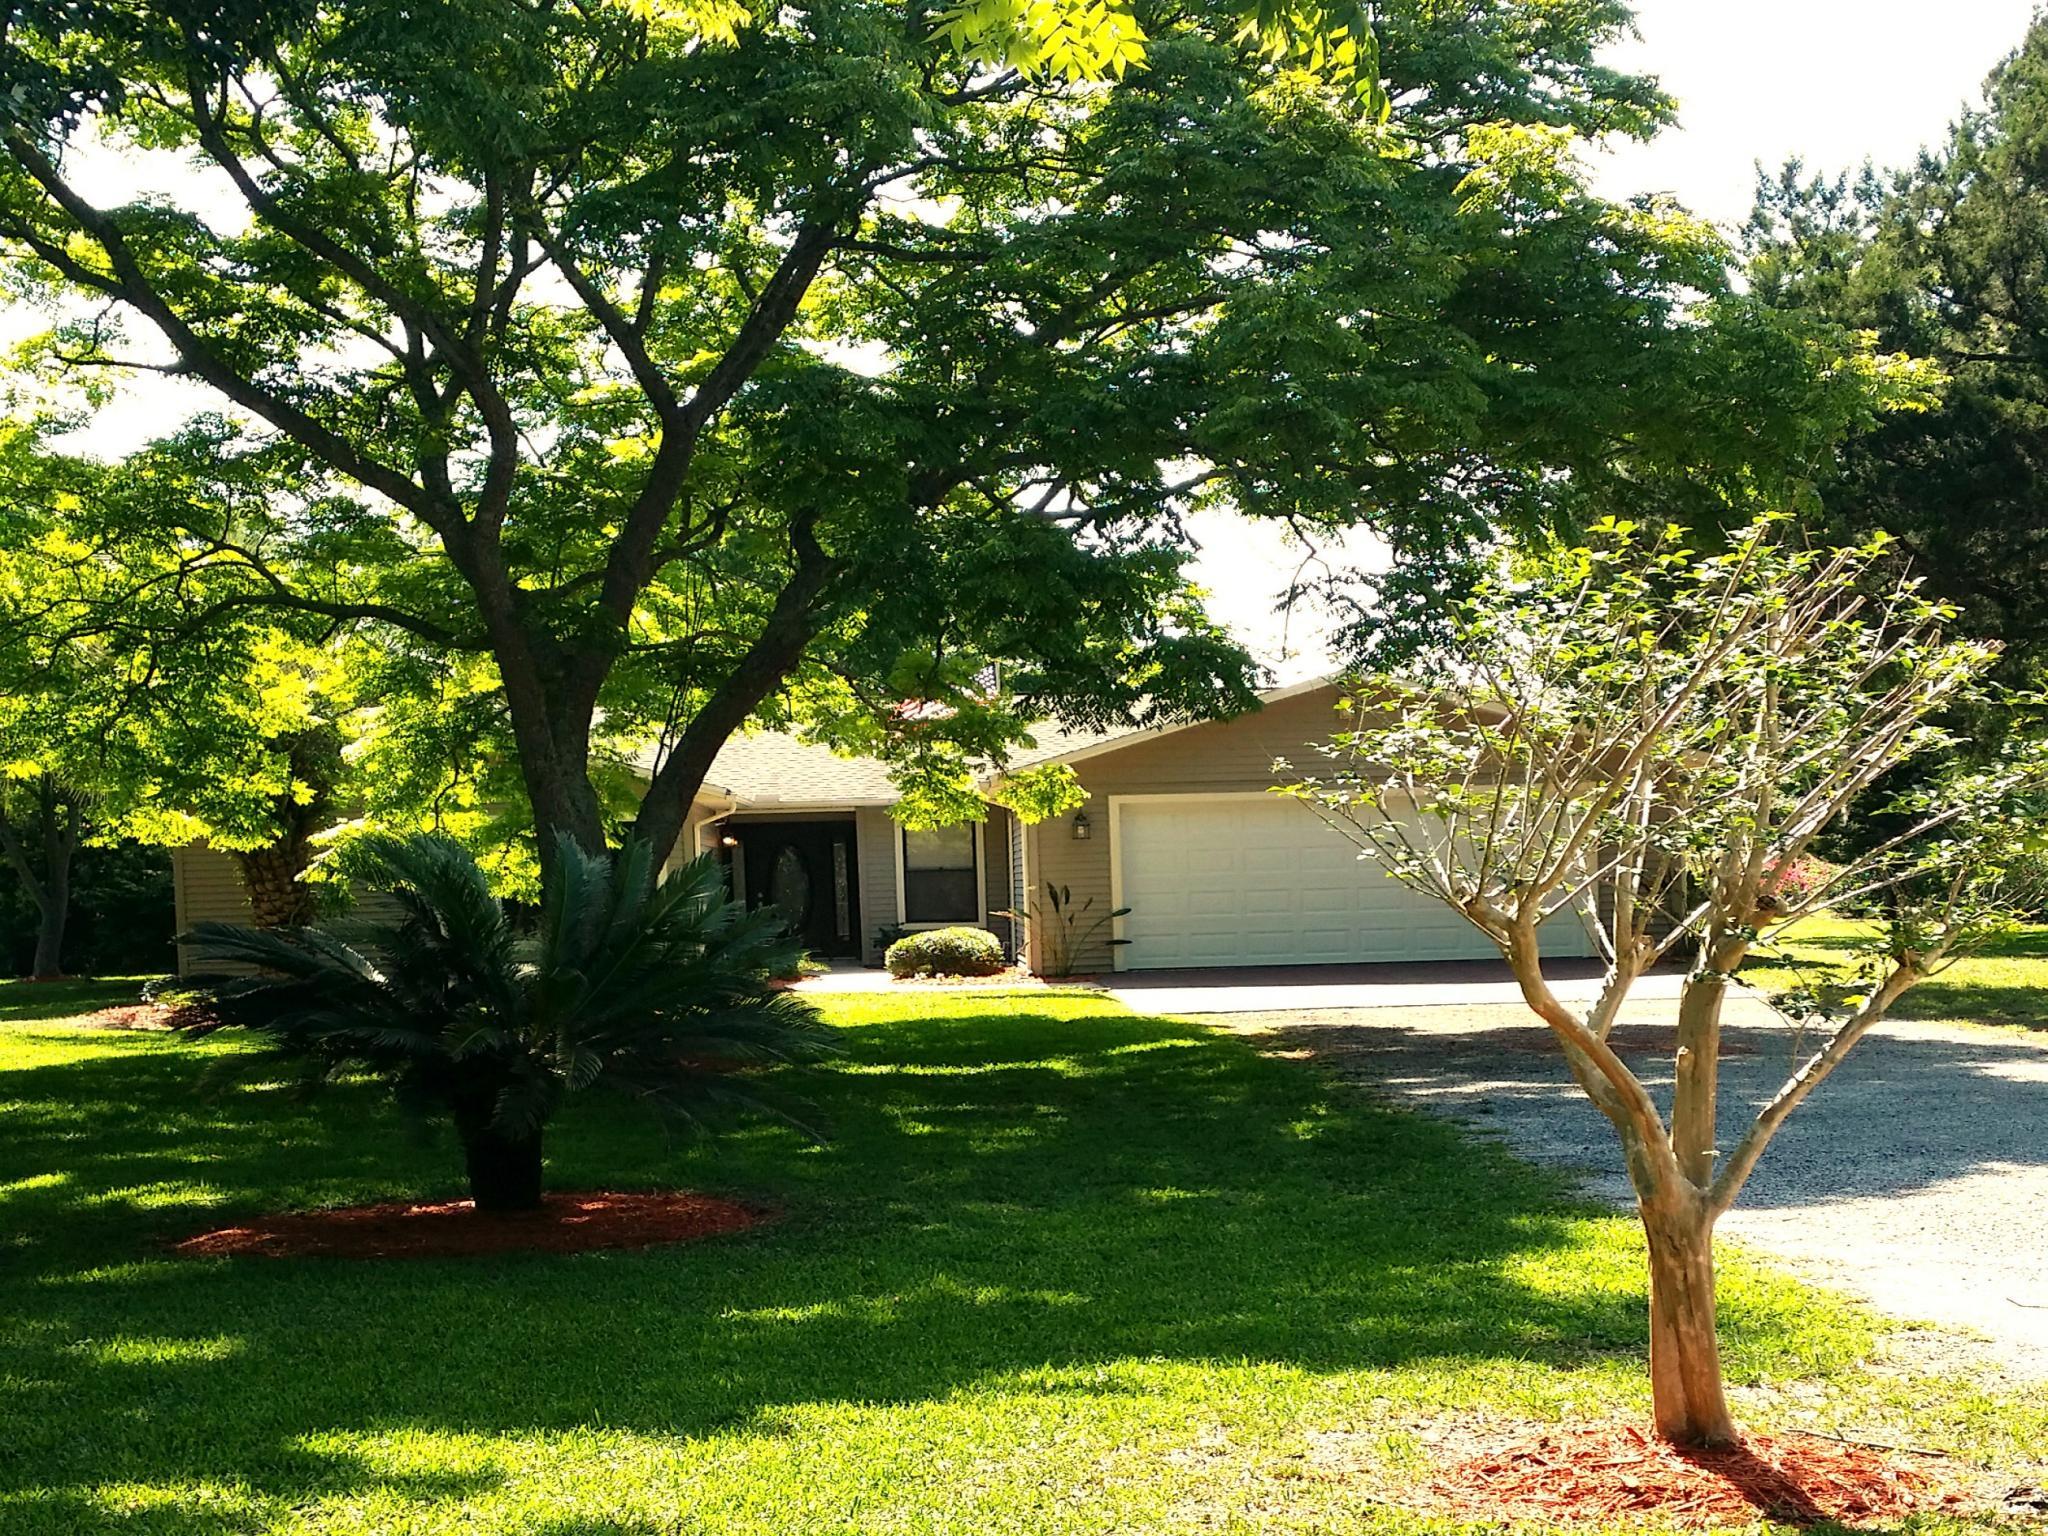 5829 Boggs Ford Rd, Port Orange, FL 32127 - Estimate and Home ...